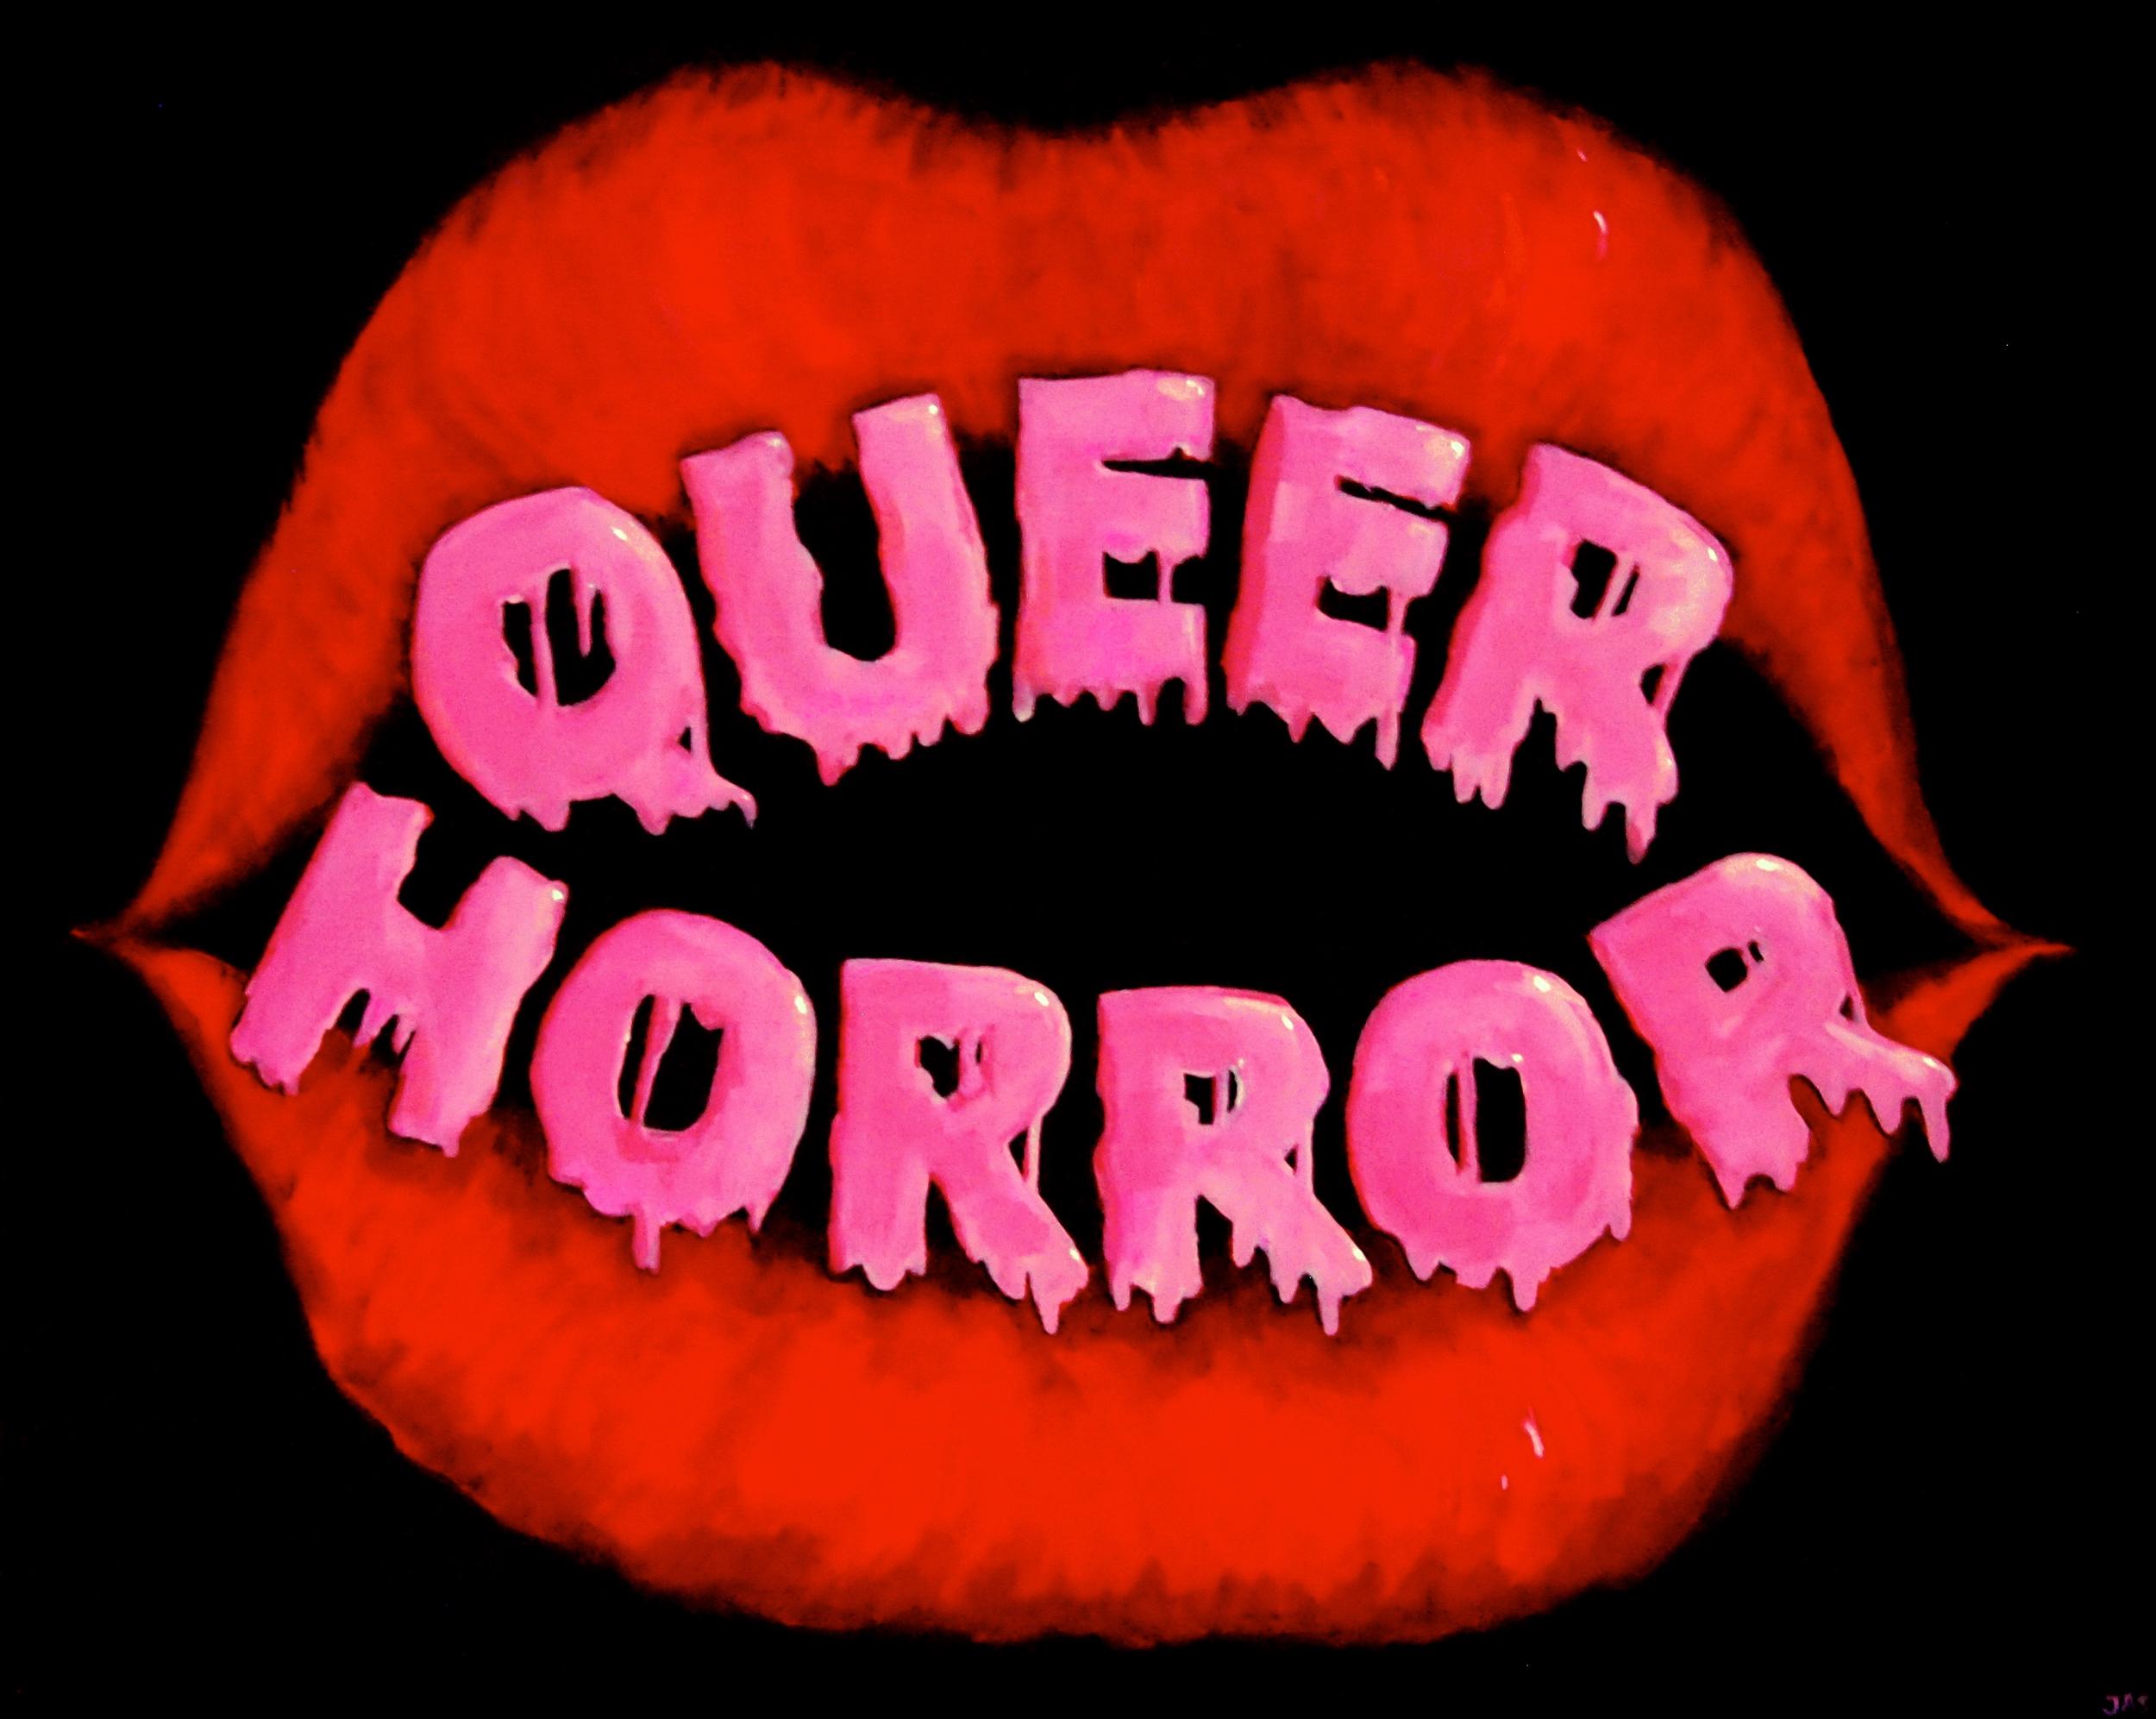 queerhorror.jpg